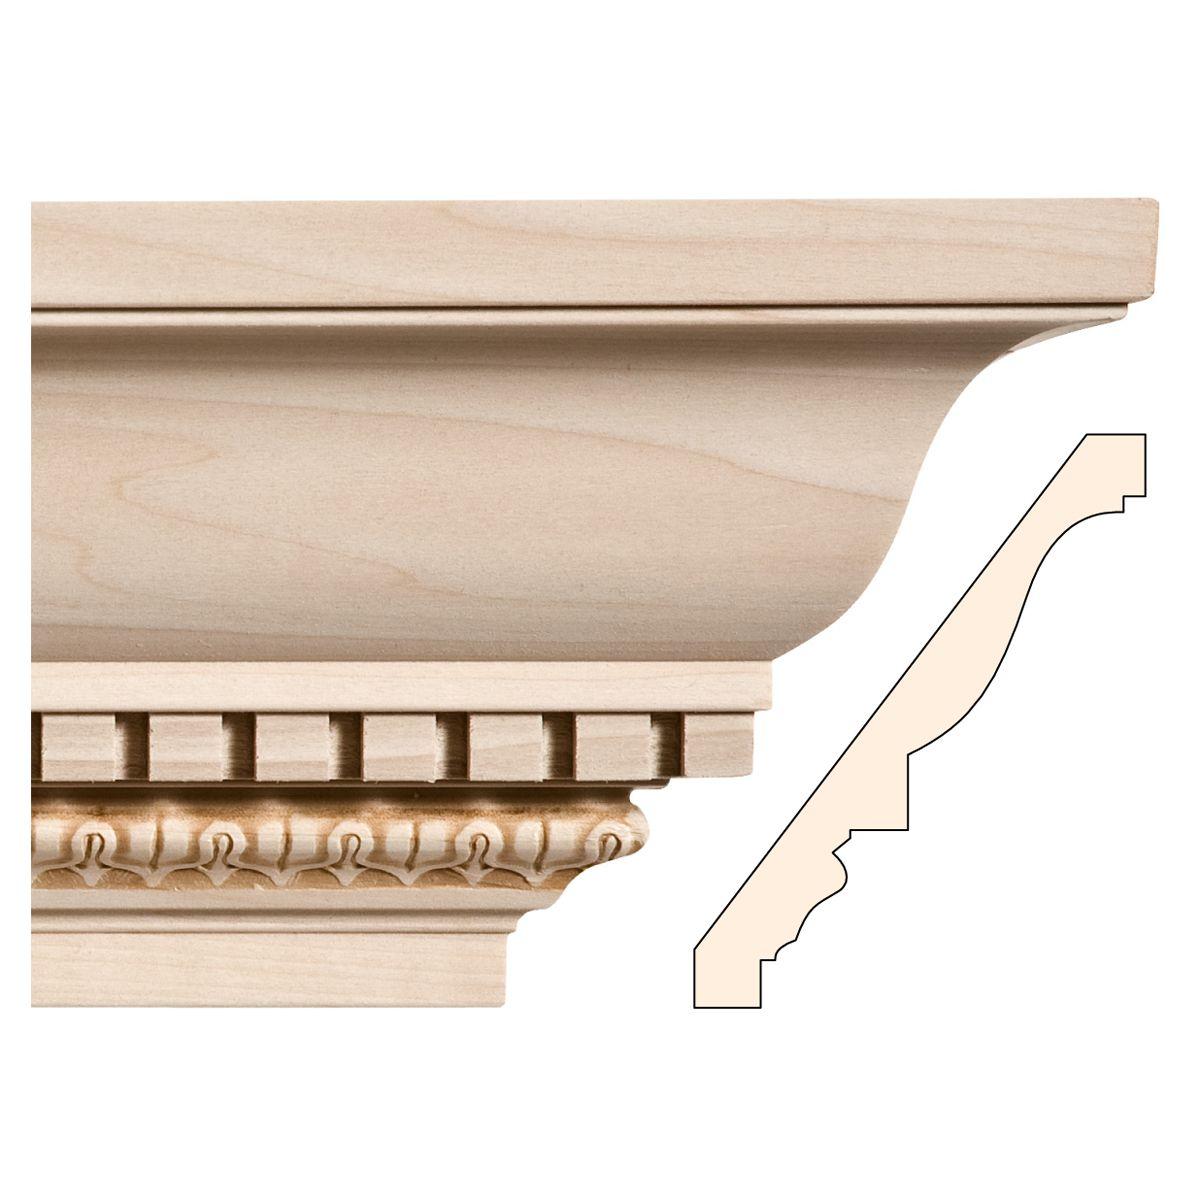 7 X 13 16 Dentil With Lamb S Tongue White River Cornice Design Pillar Design Interior Exterior Doors